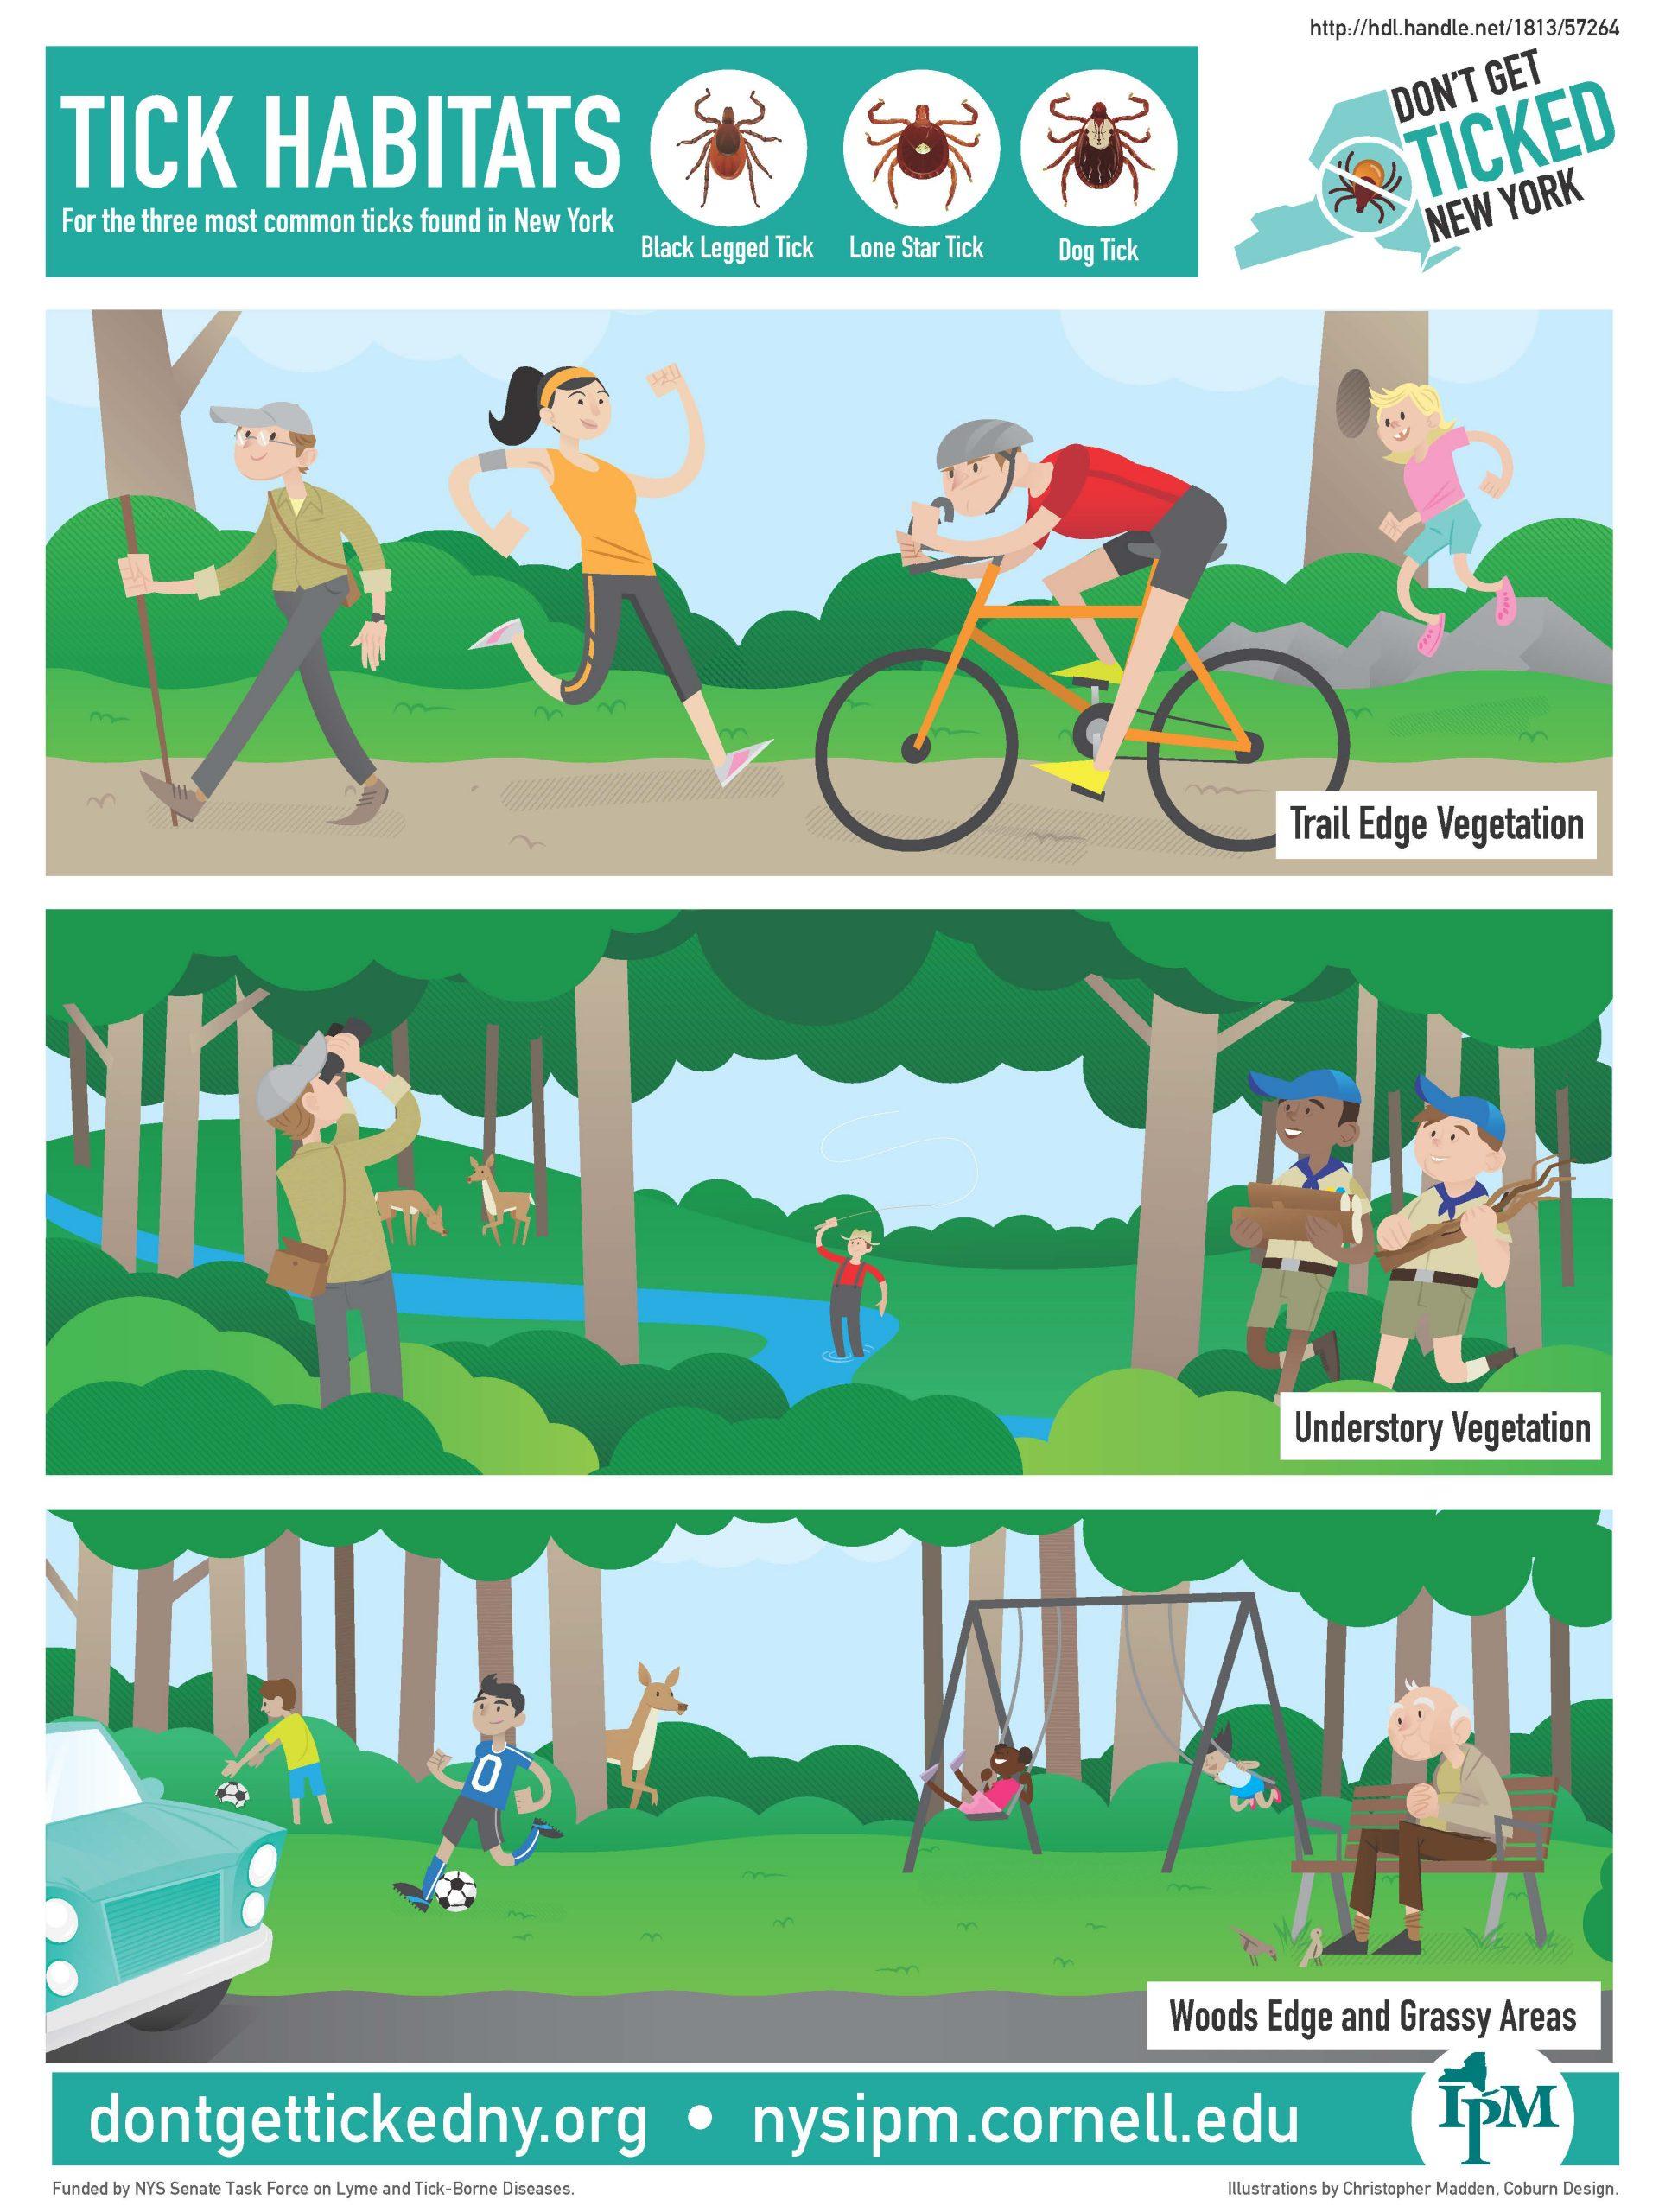 Infographic describing different tick habitats